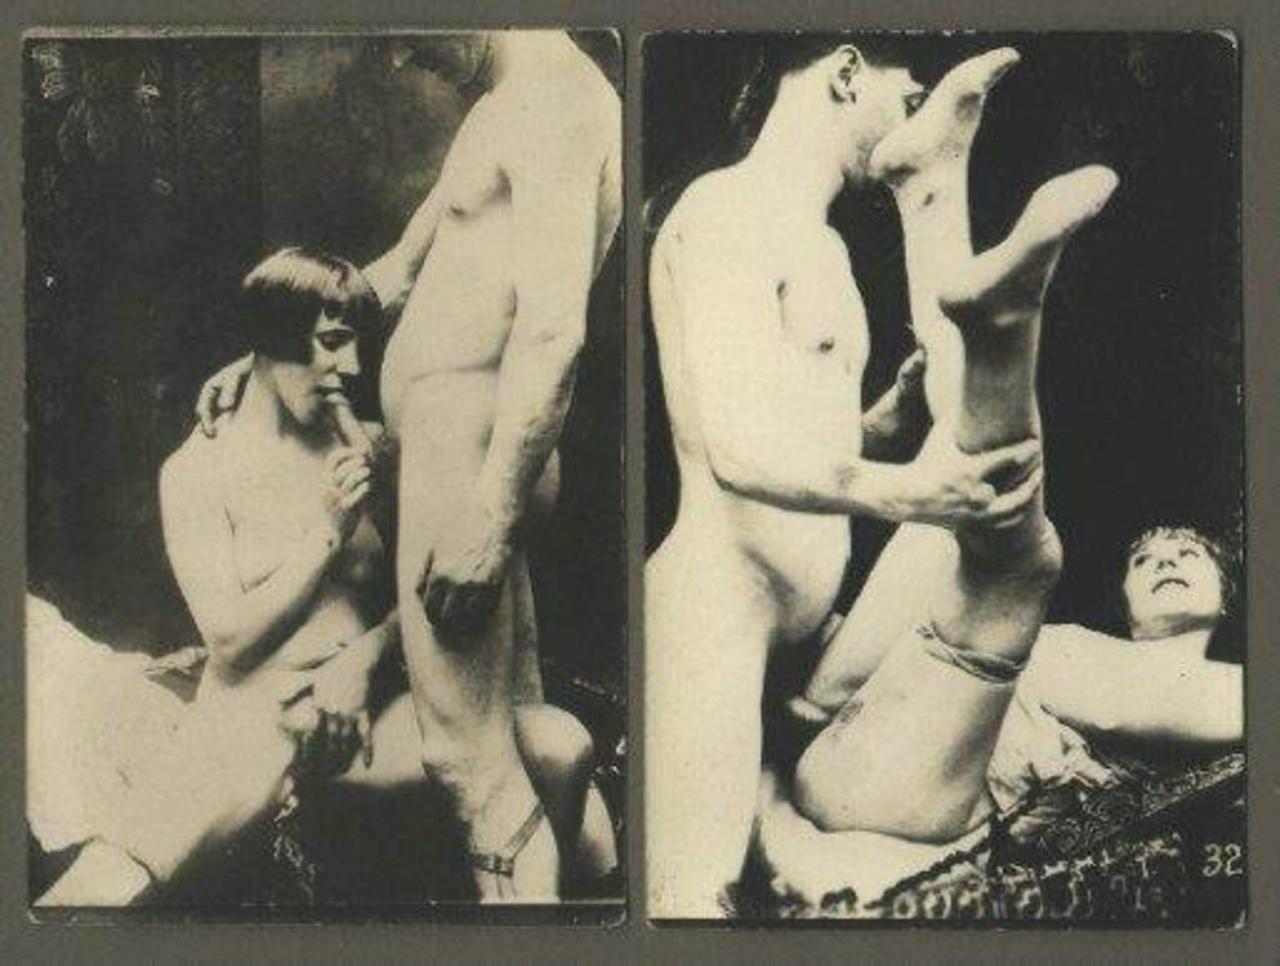 retro-porno-18-vek